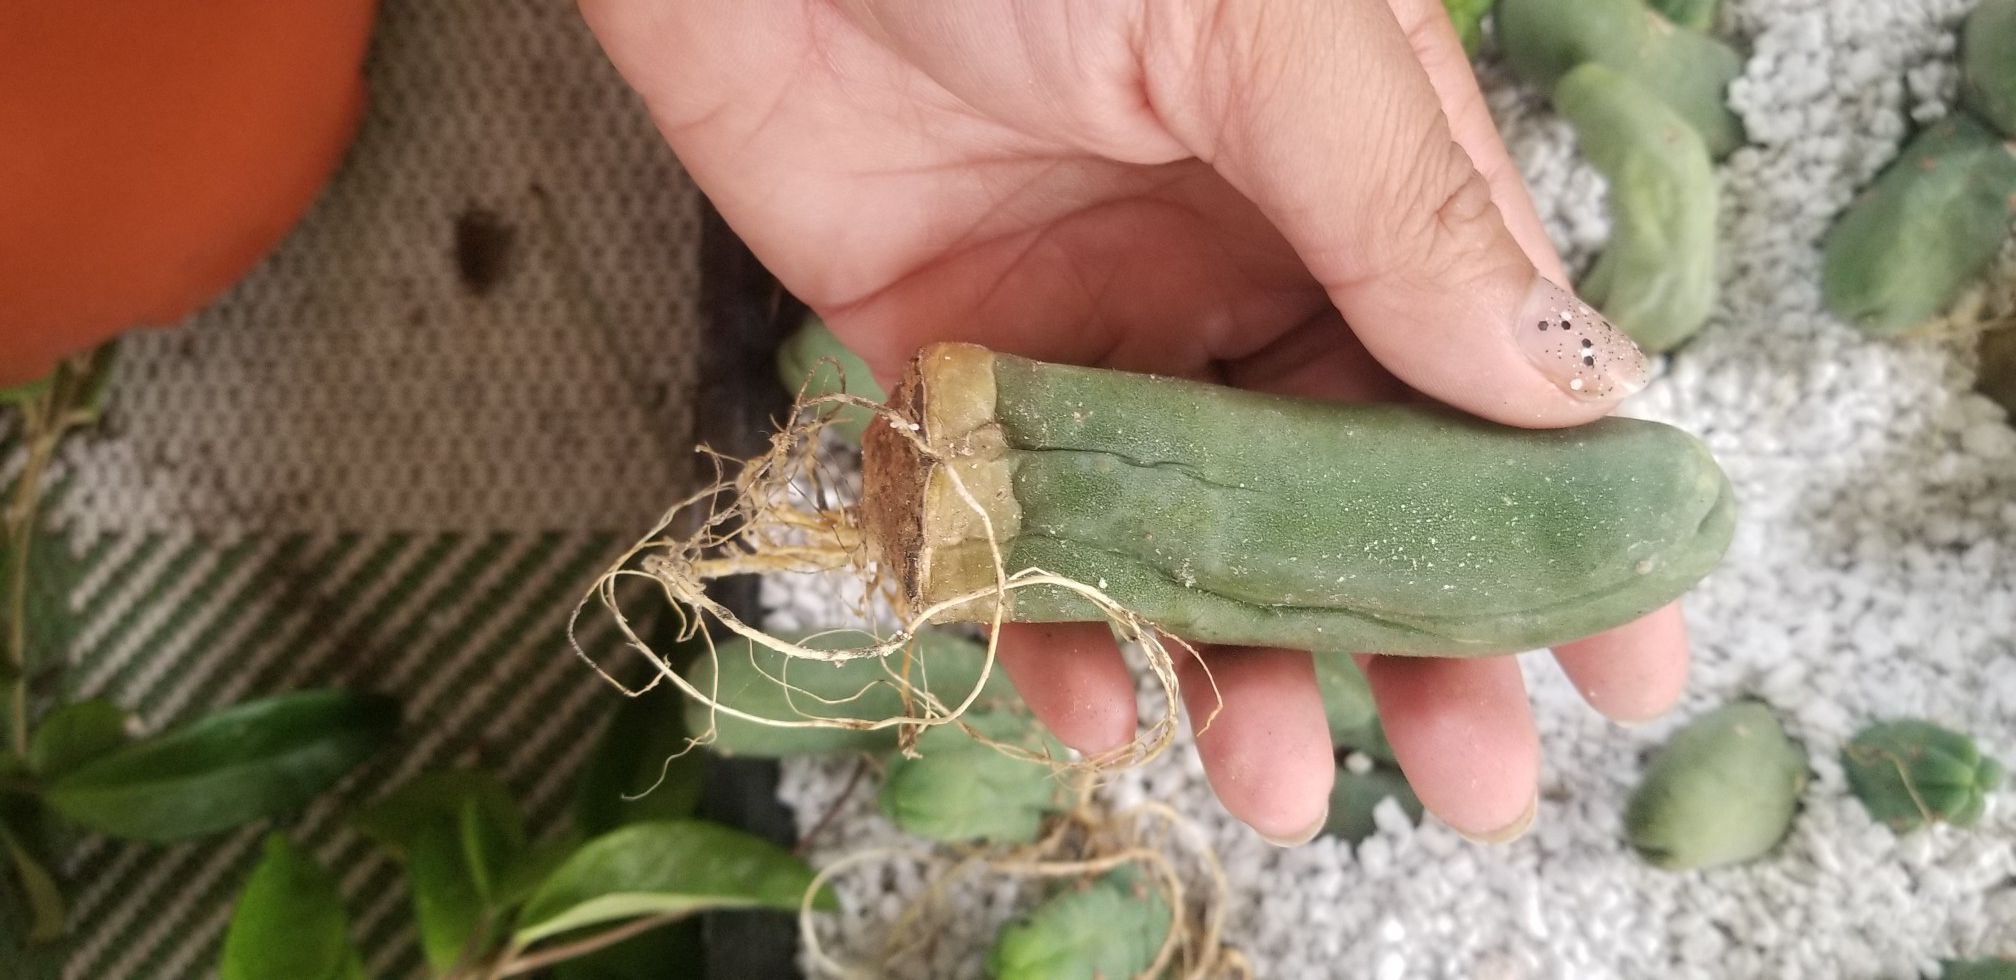 Pen is cactus